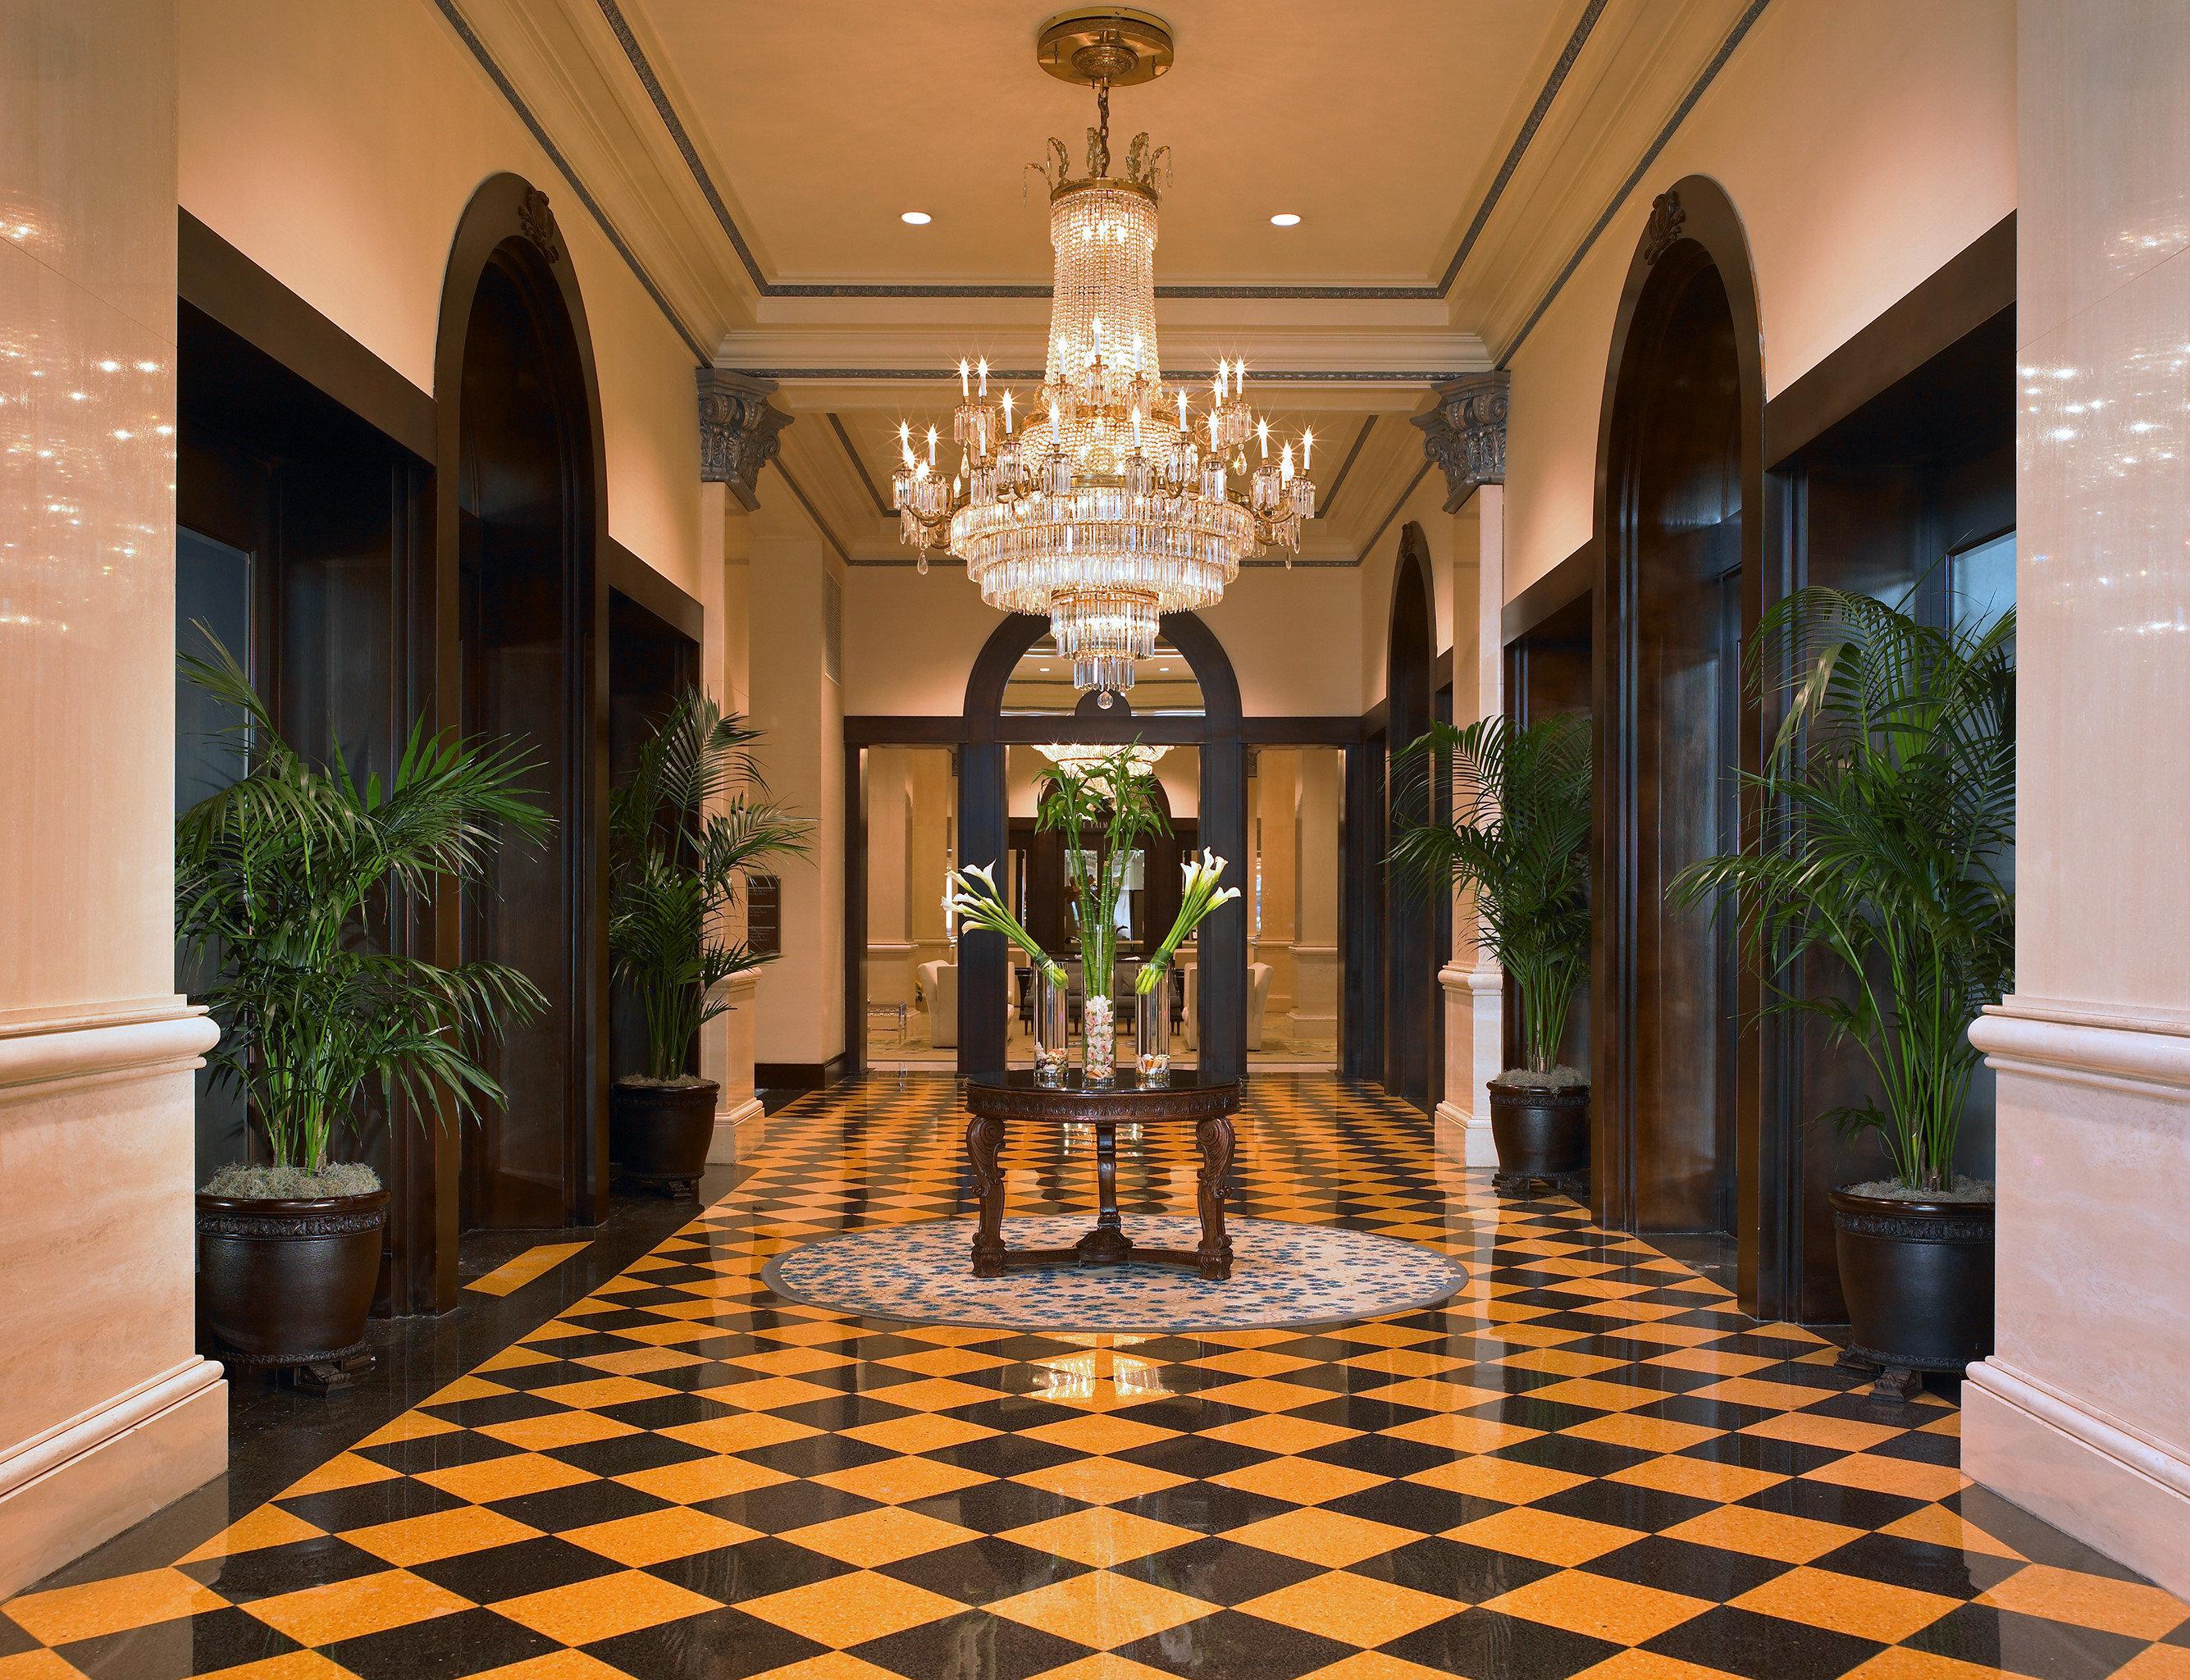 Elegant Hotels Lobby Lounge property building mansion palace home flooring hall living room condominium ballroom Resort